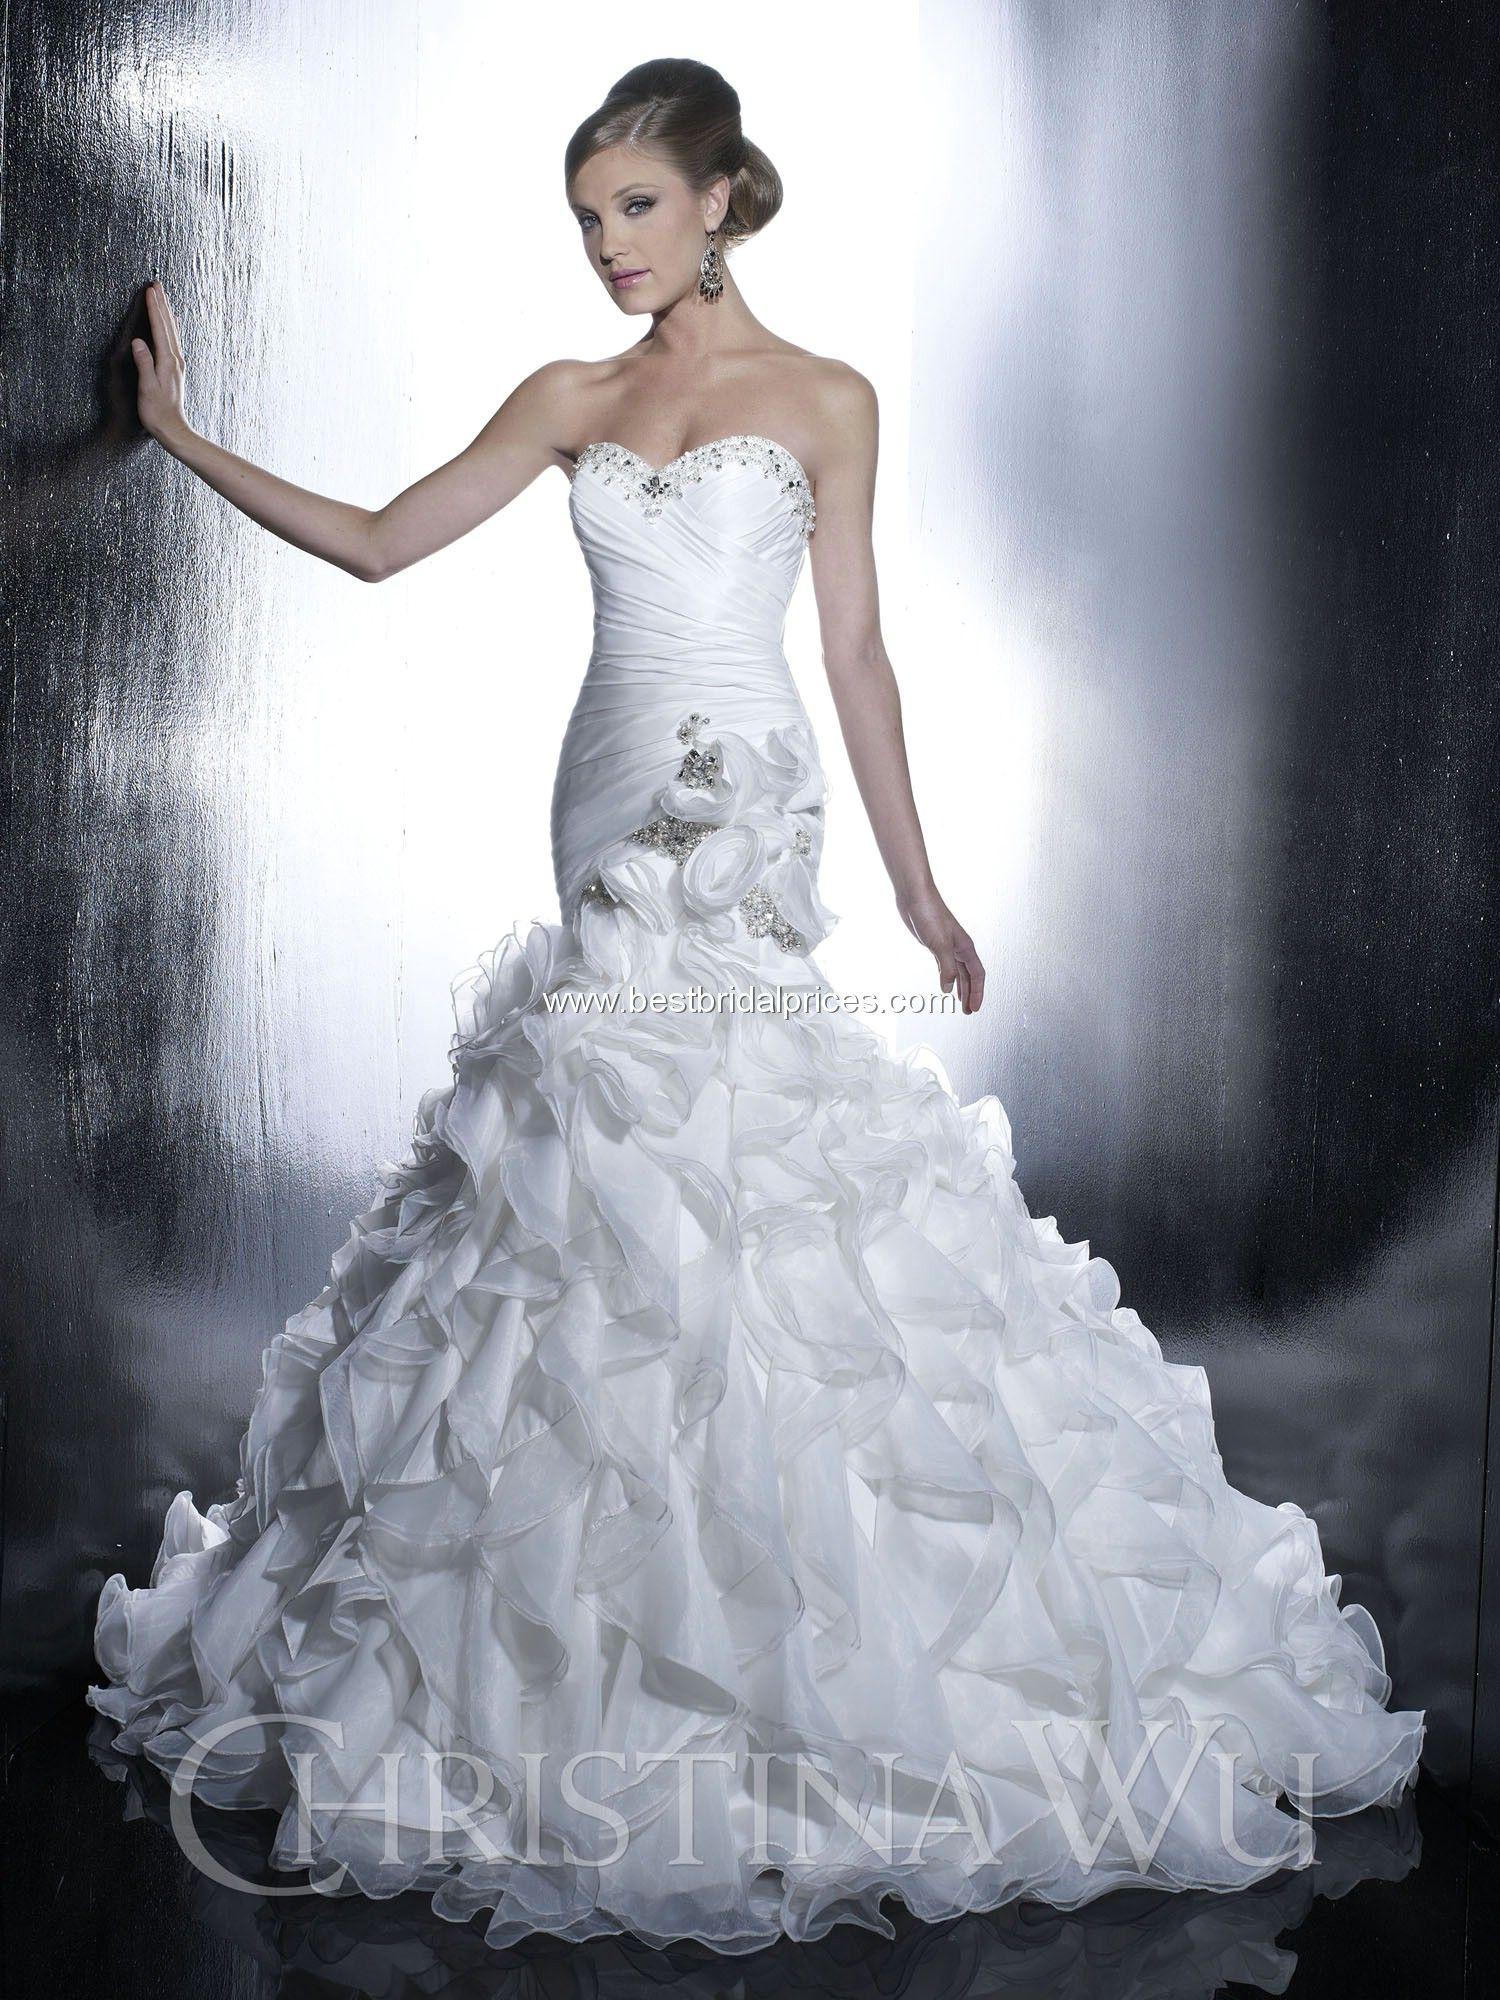 Christina Wu Wedding Dresses - Style 15513 #wedding #dress | The ...